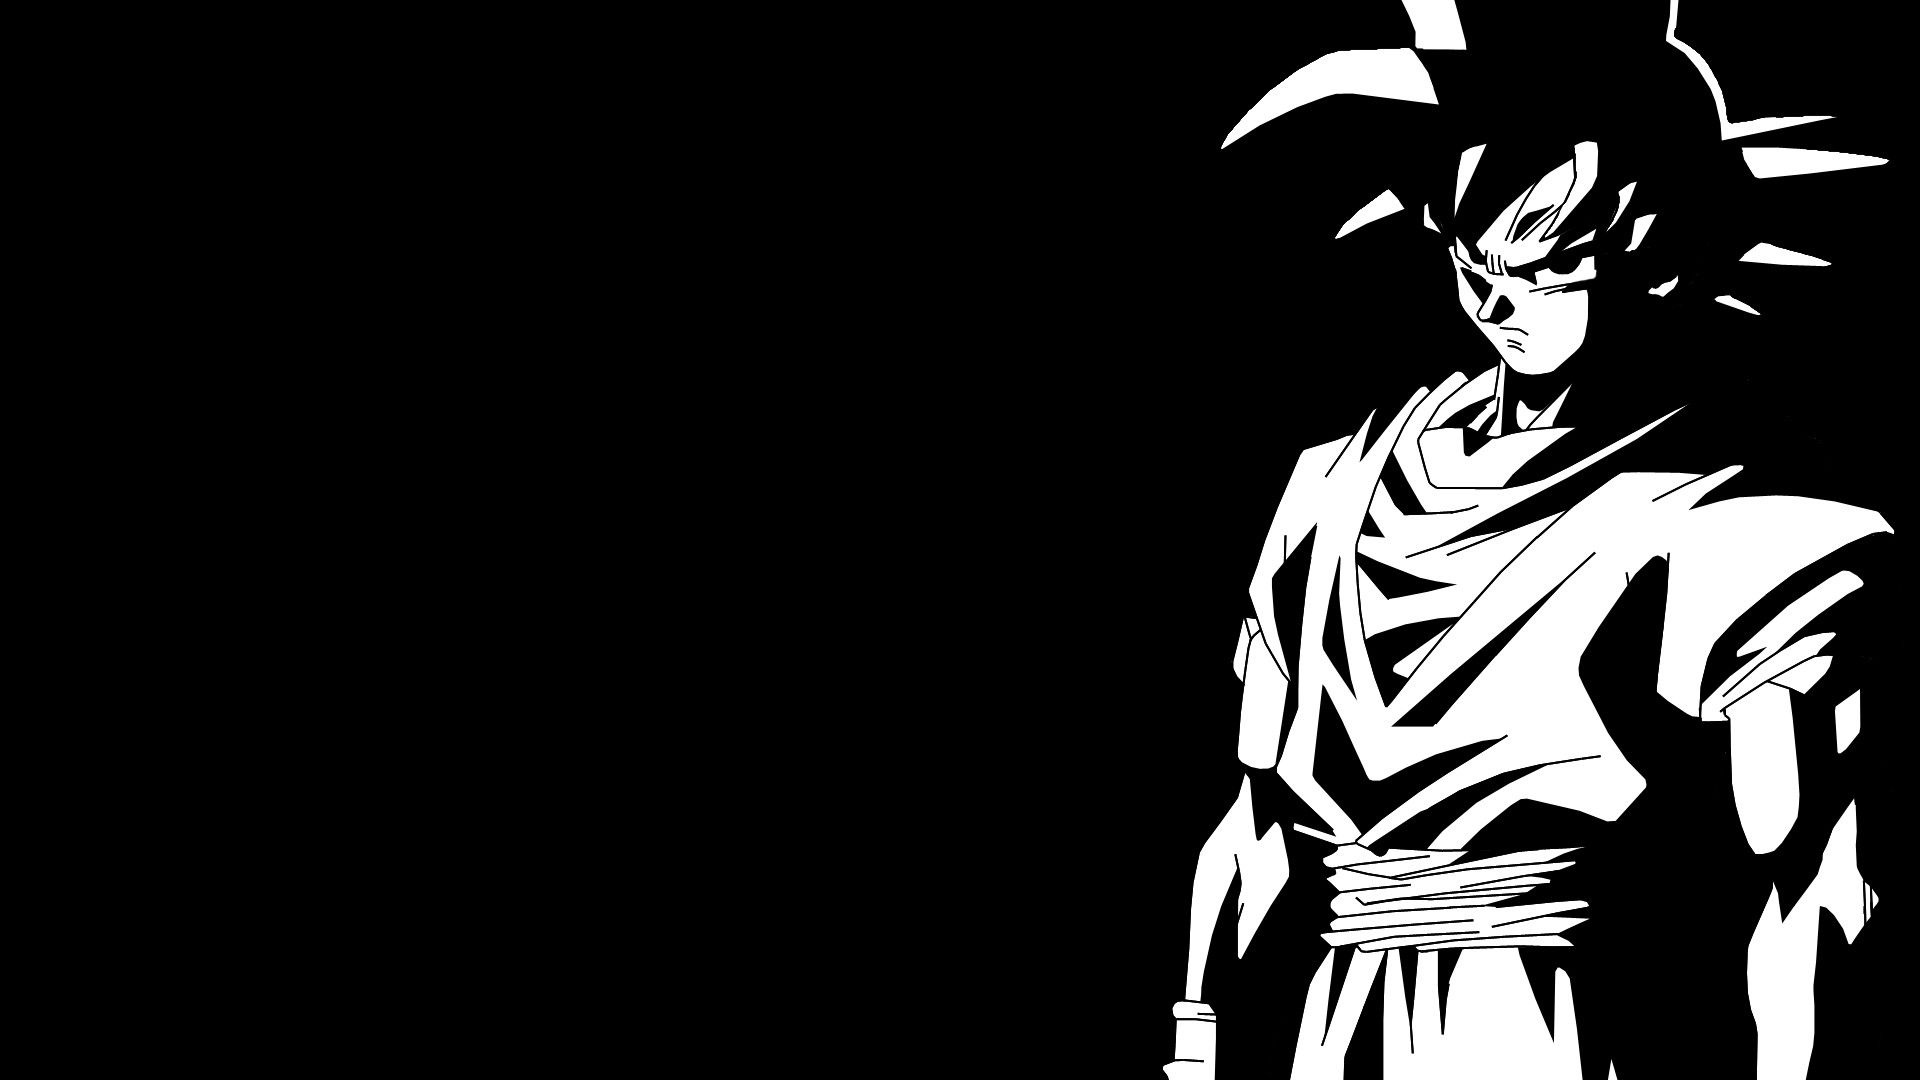 Goku Black wallpaper hd